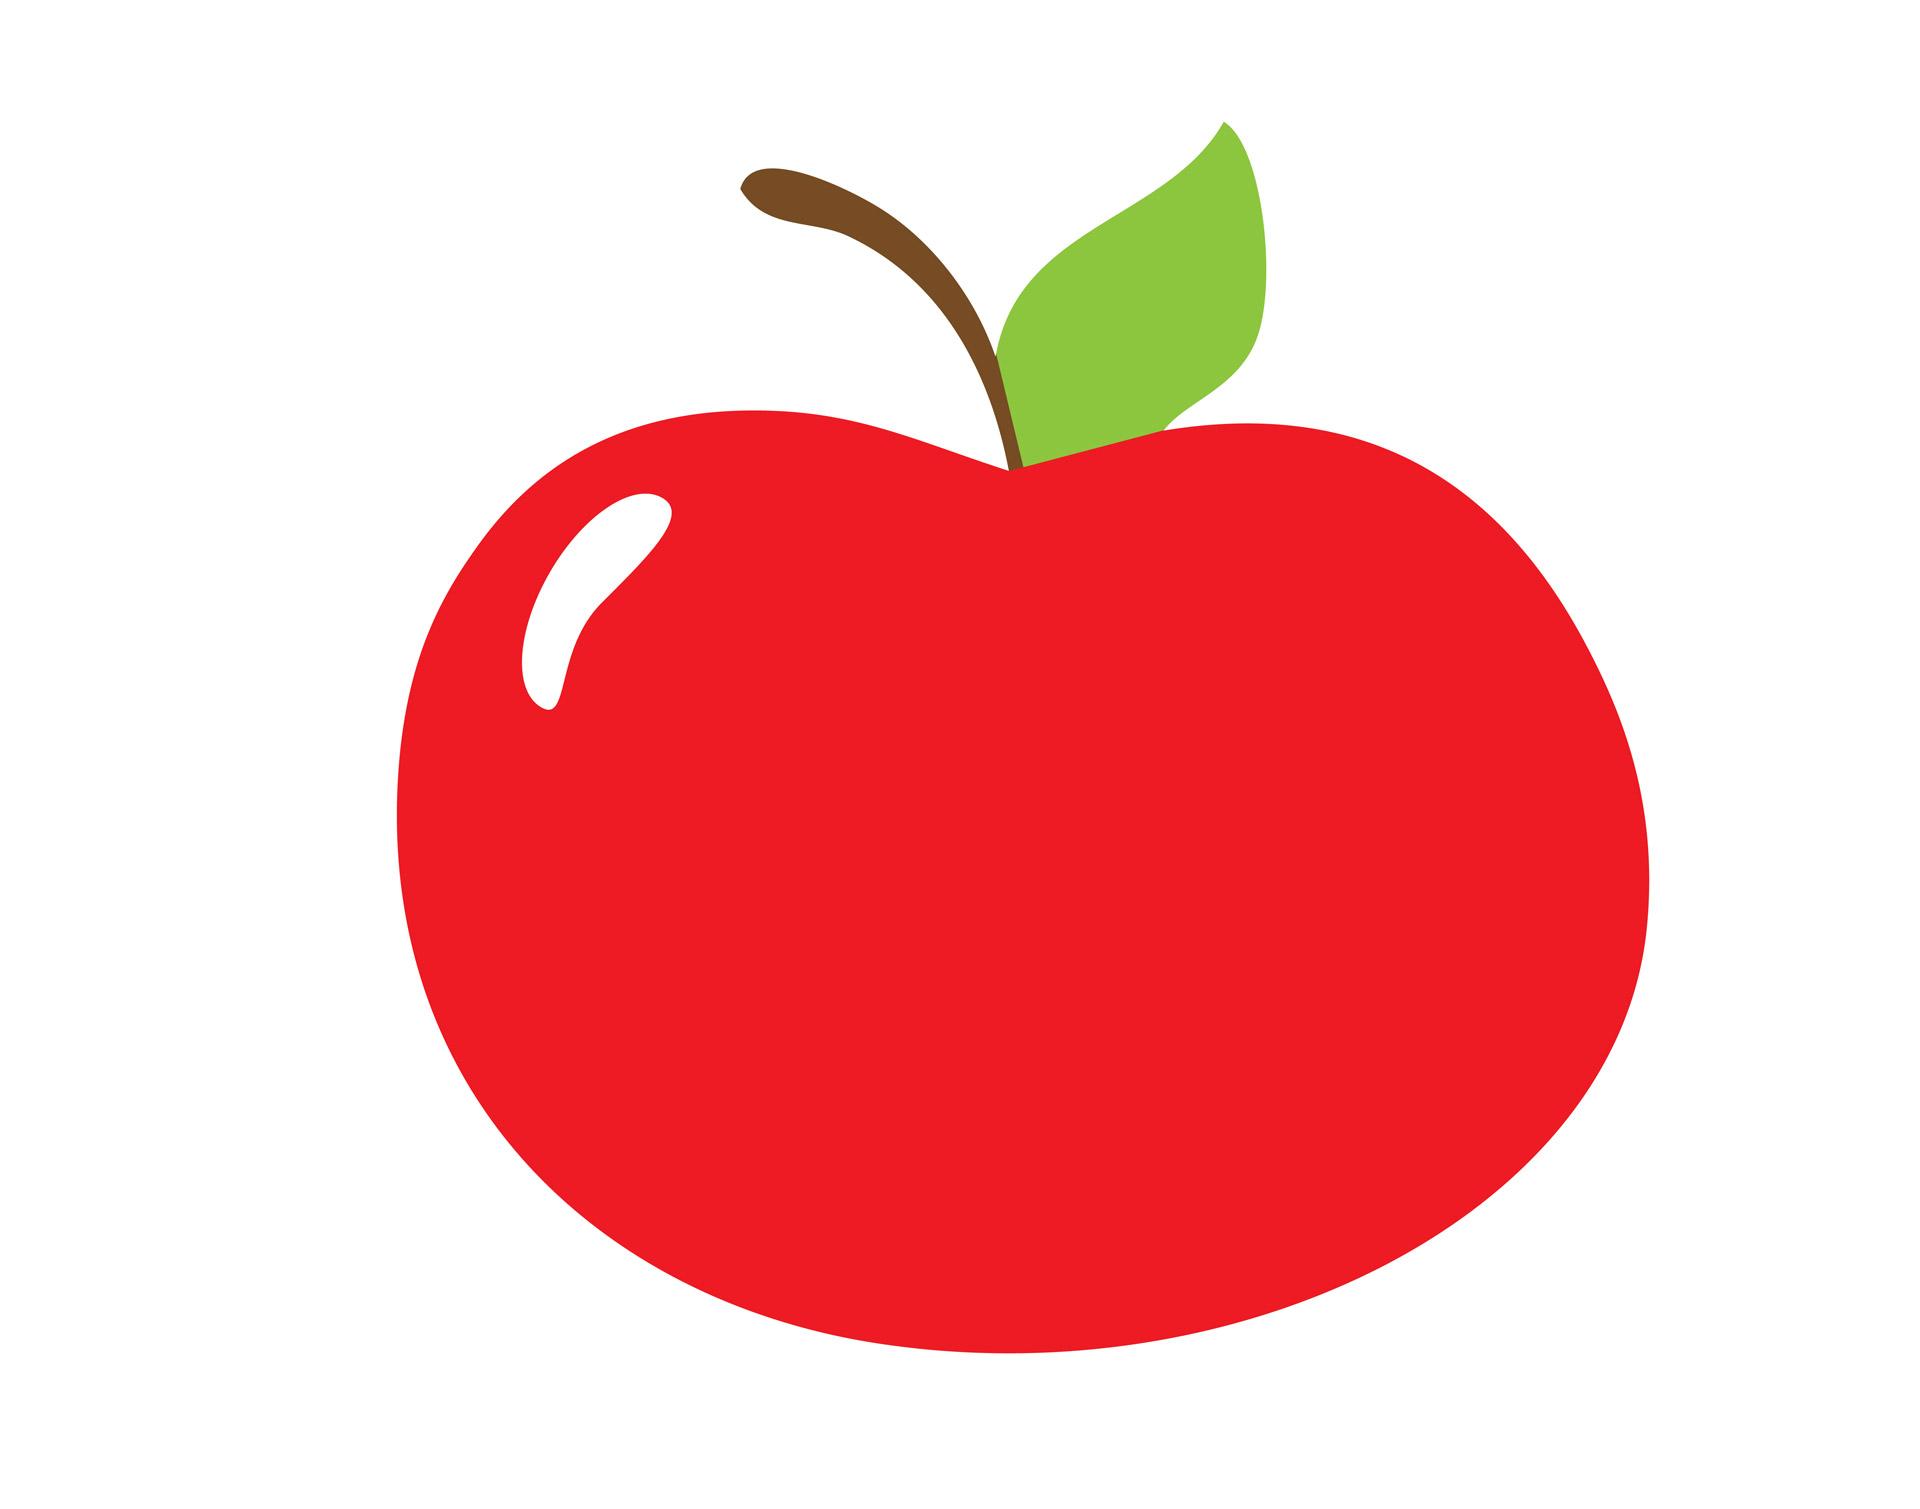 Clip Art Apple & Clip Art Apple Clip Art Images.